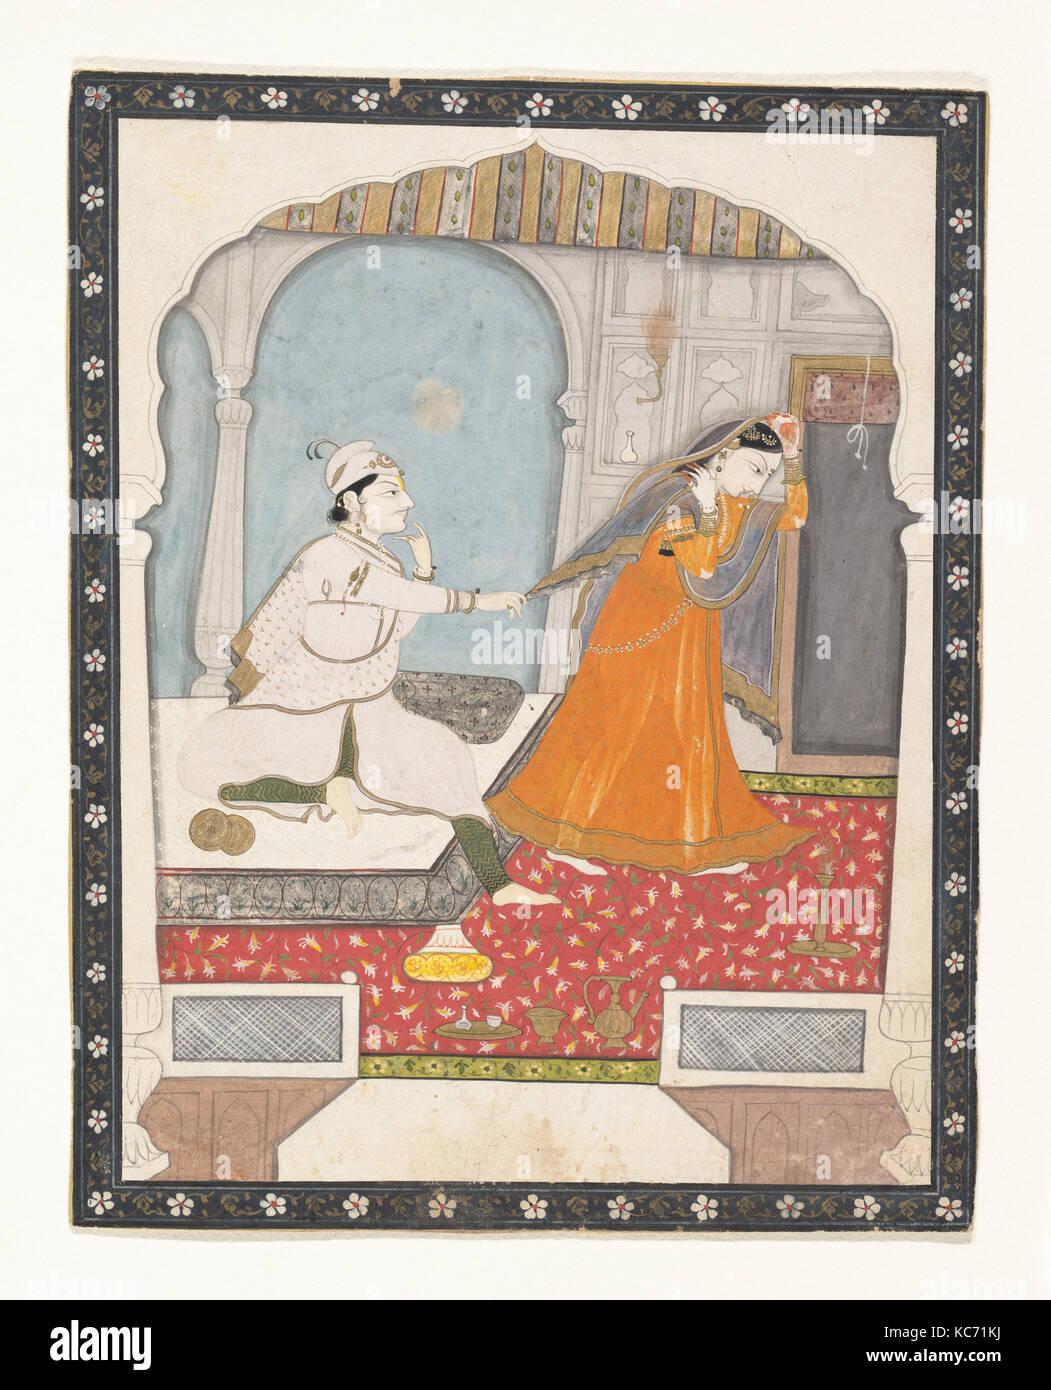 La timida sposa, ca. 1800, India (Punjab Hills, Kangra), inchiostro opaco, acquerelli e dorate su carta, 7 1/4 x Immagini Stock